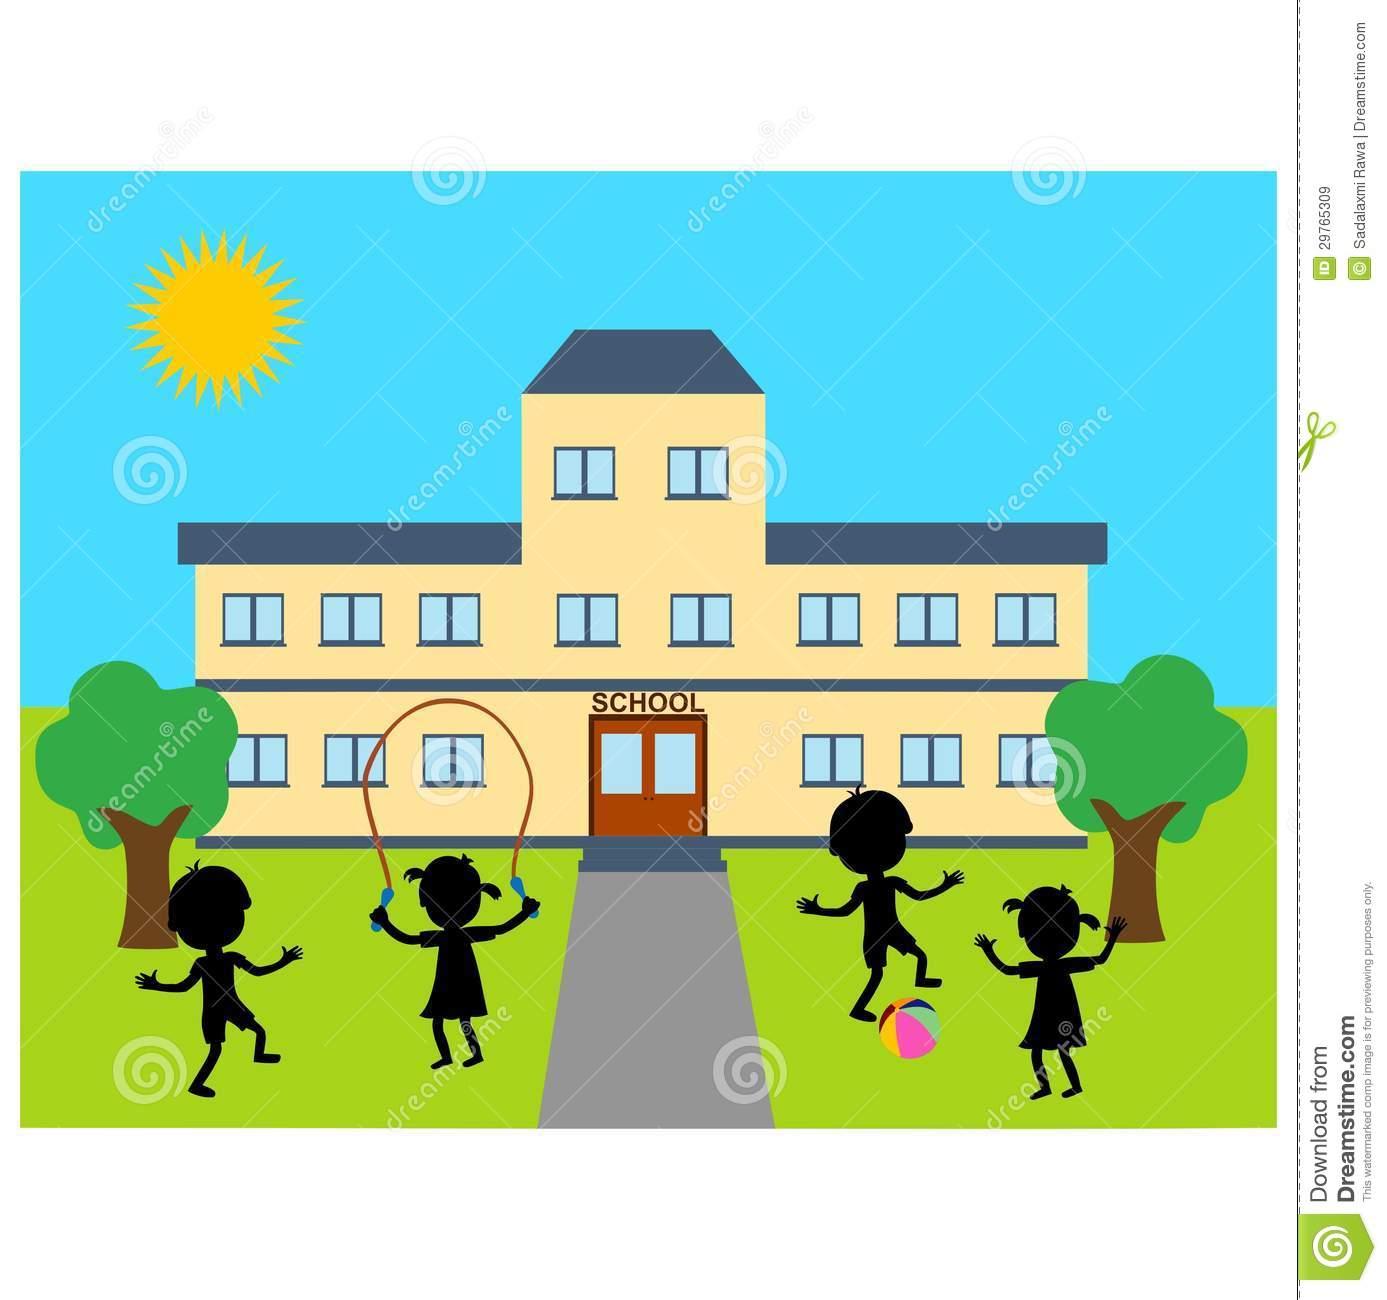 School Building Clipart Illustration School Building Children Playing